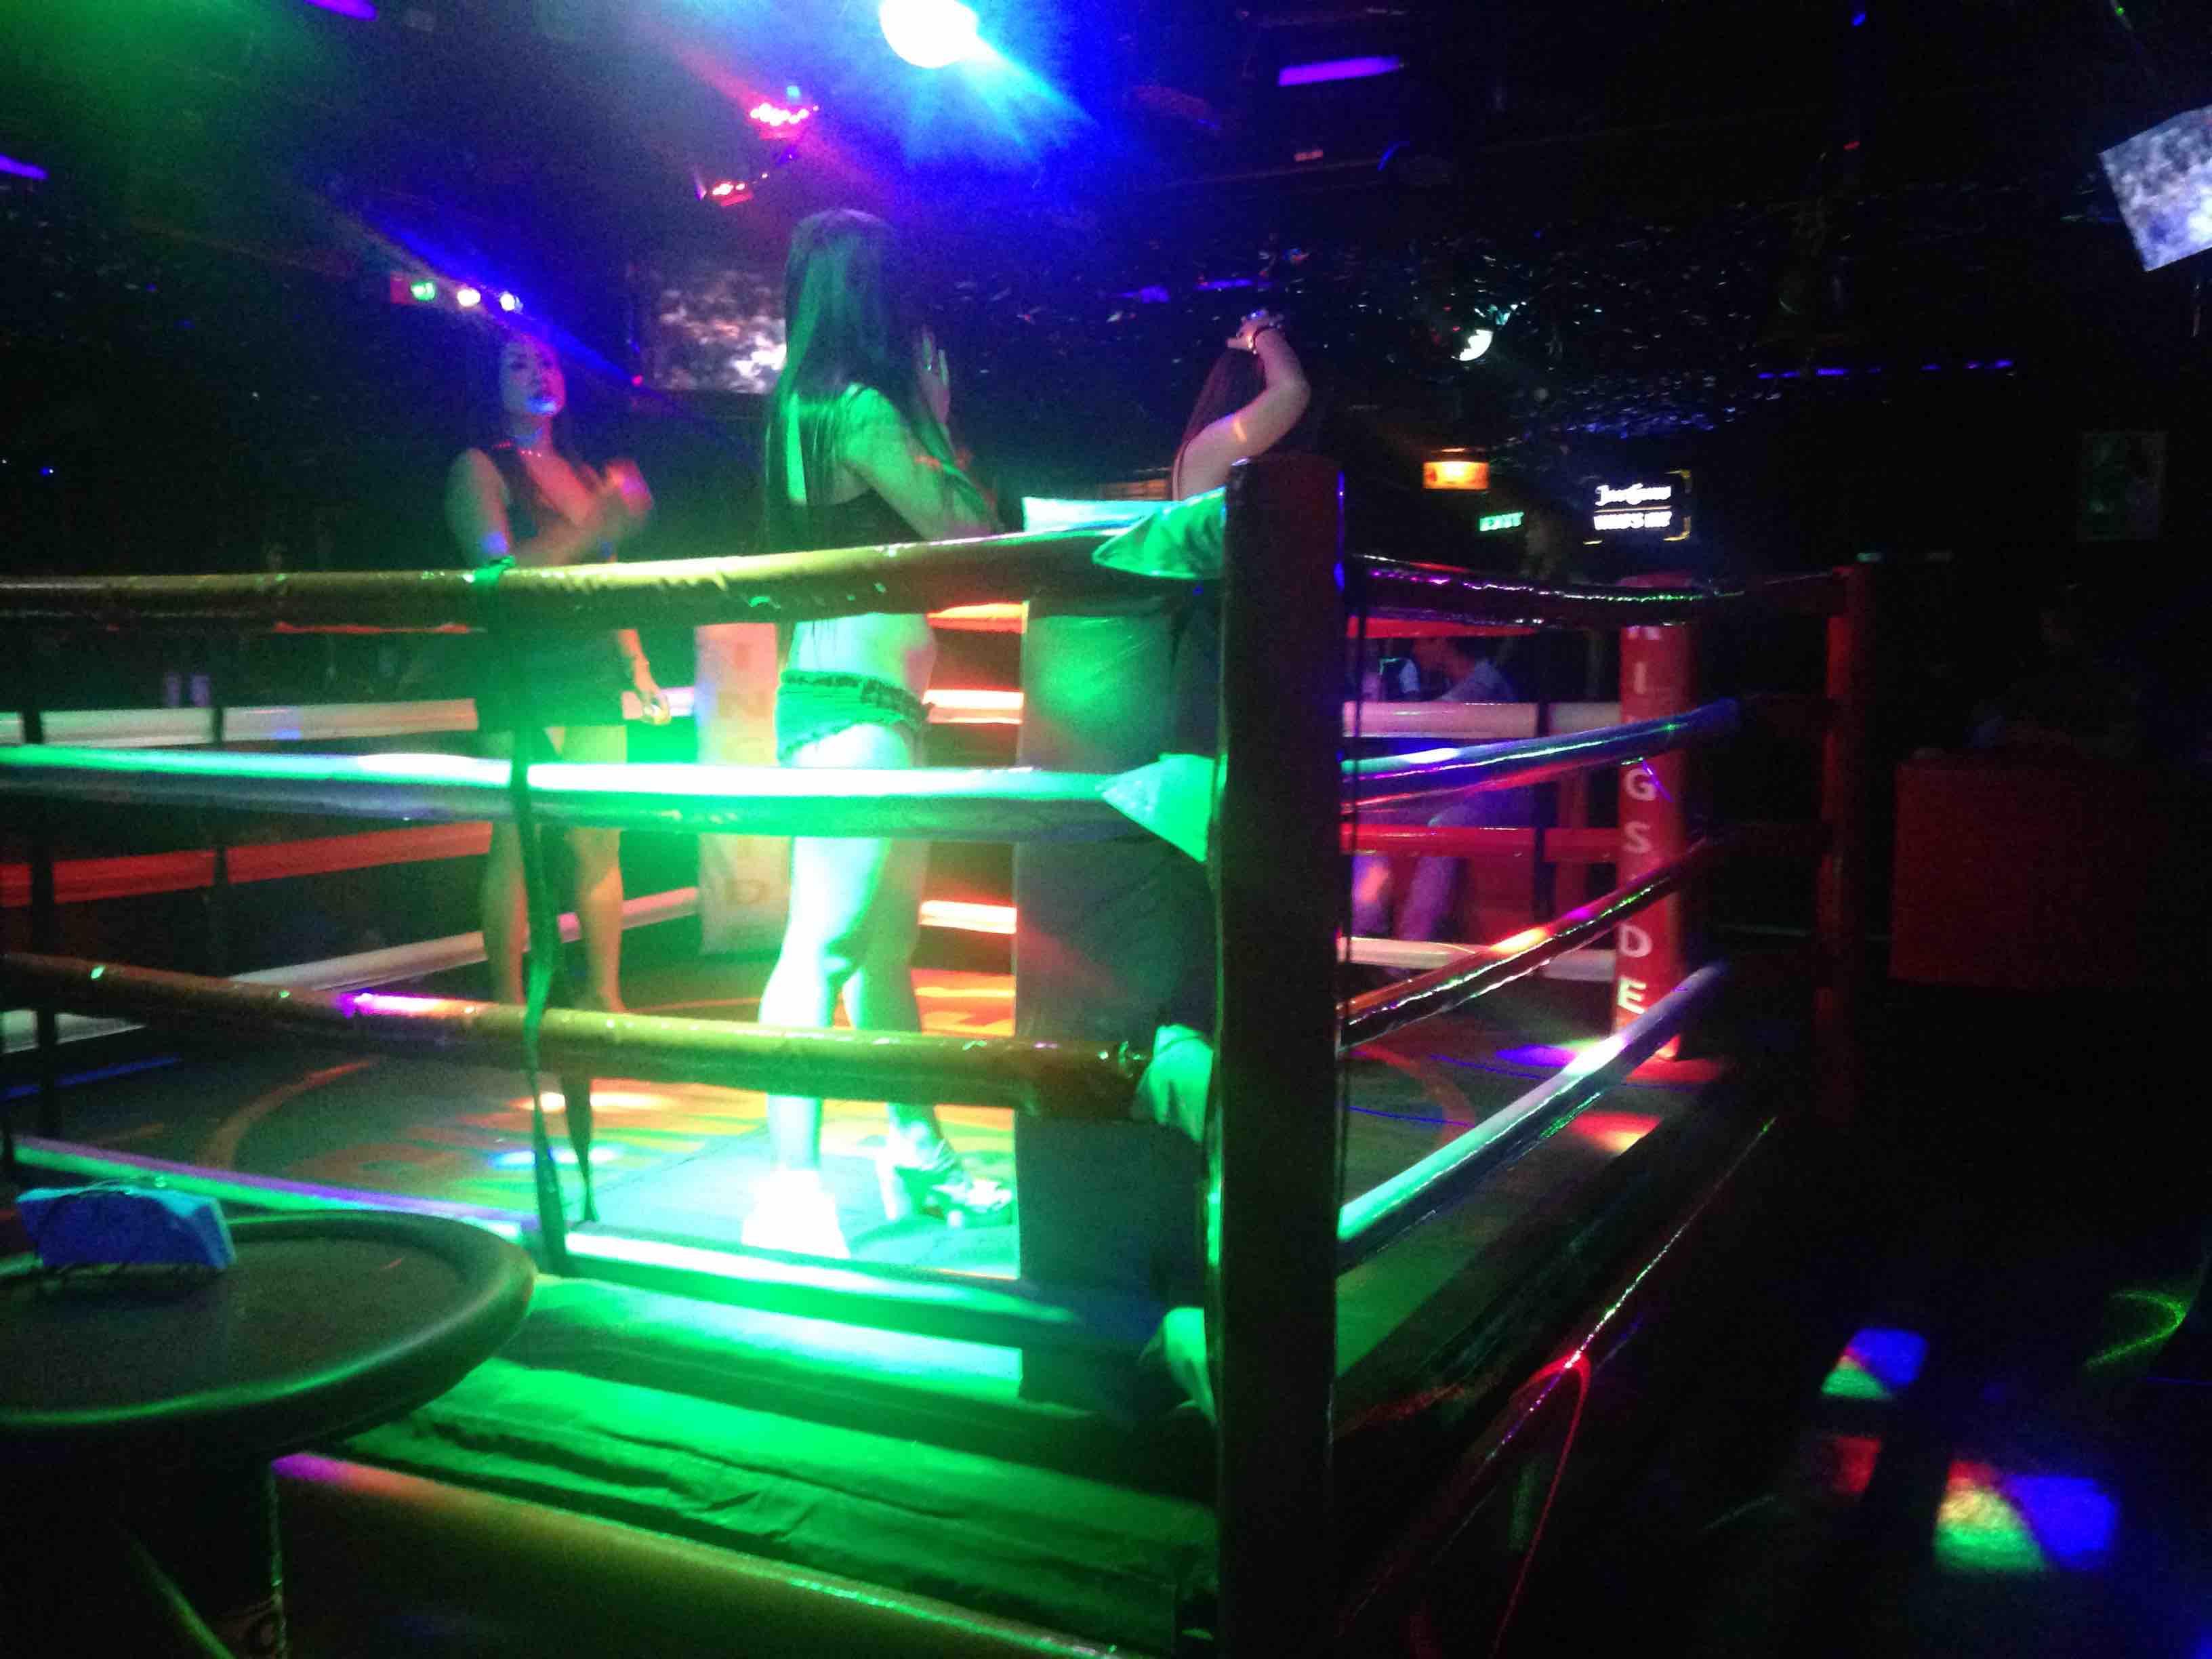 Bored looking girls dance between boxing